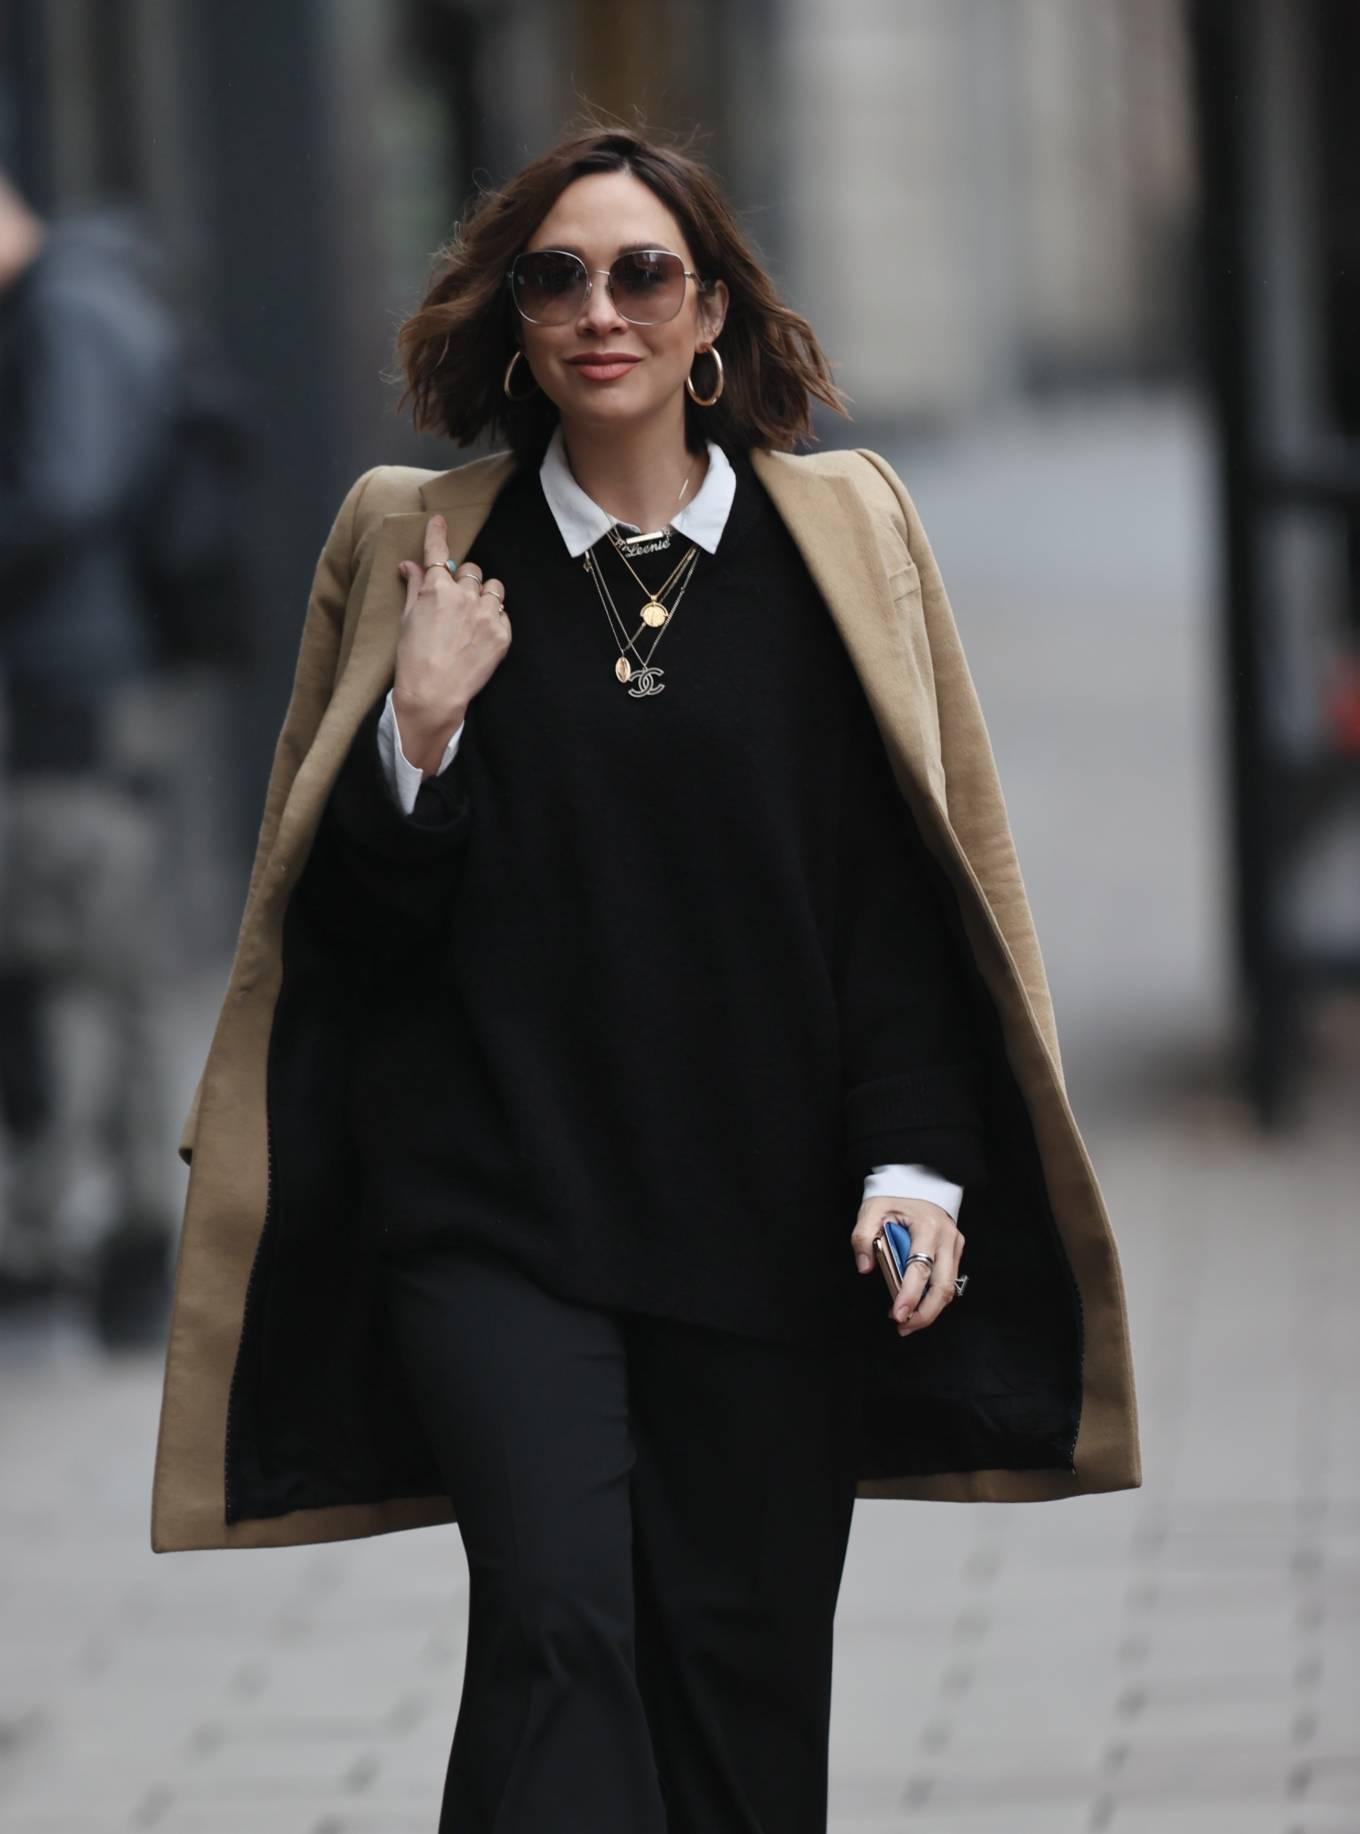 Myleene Klass - Looking chic in black in London